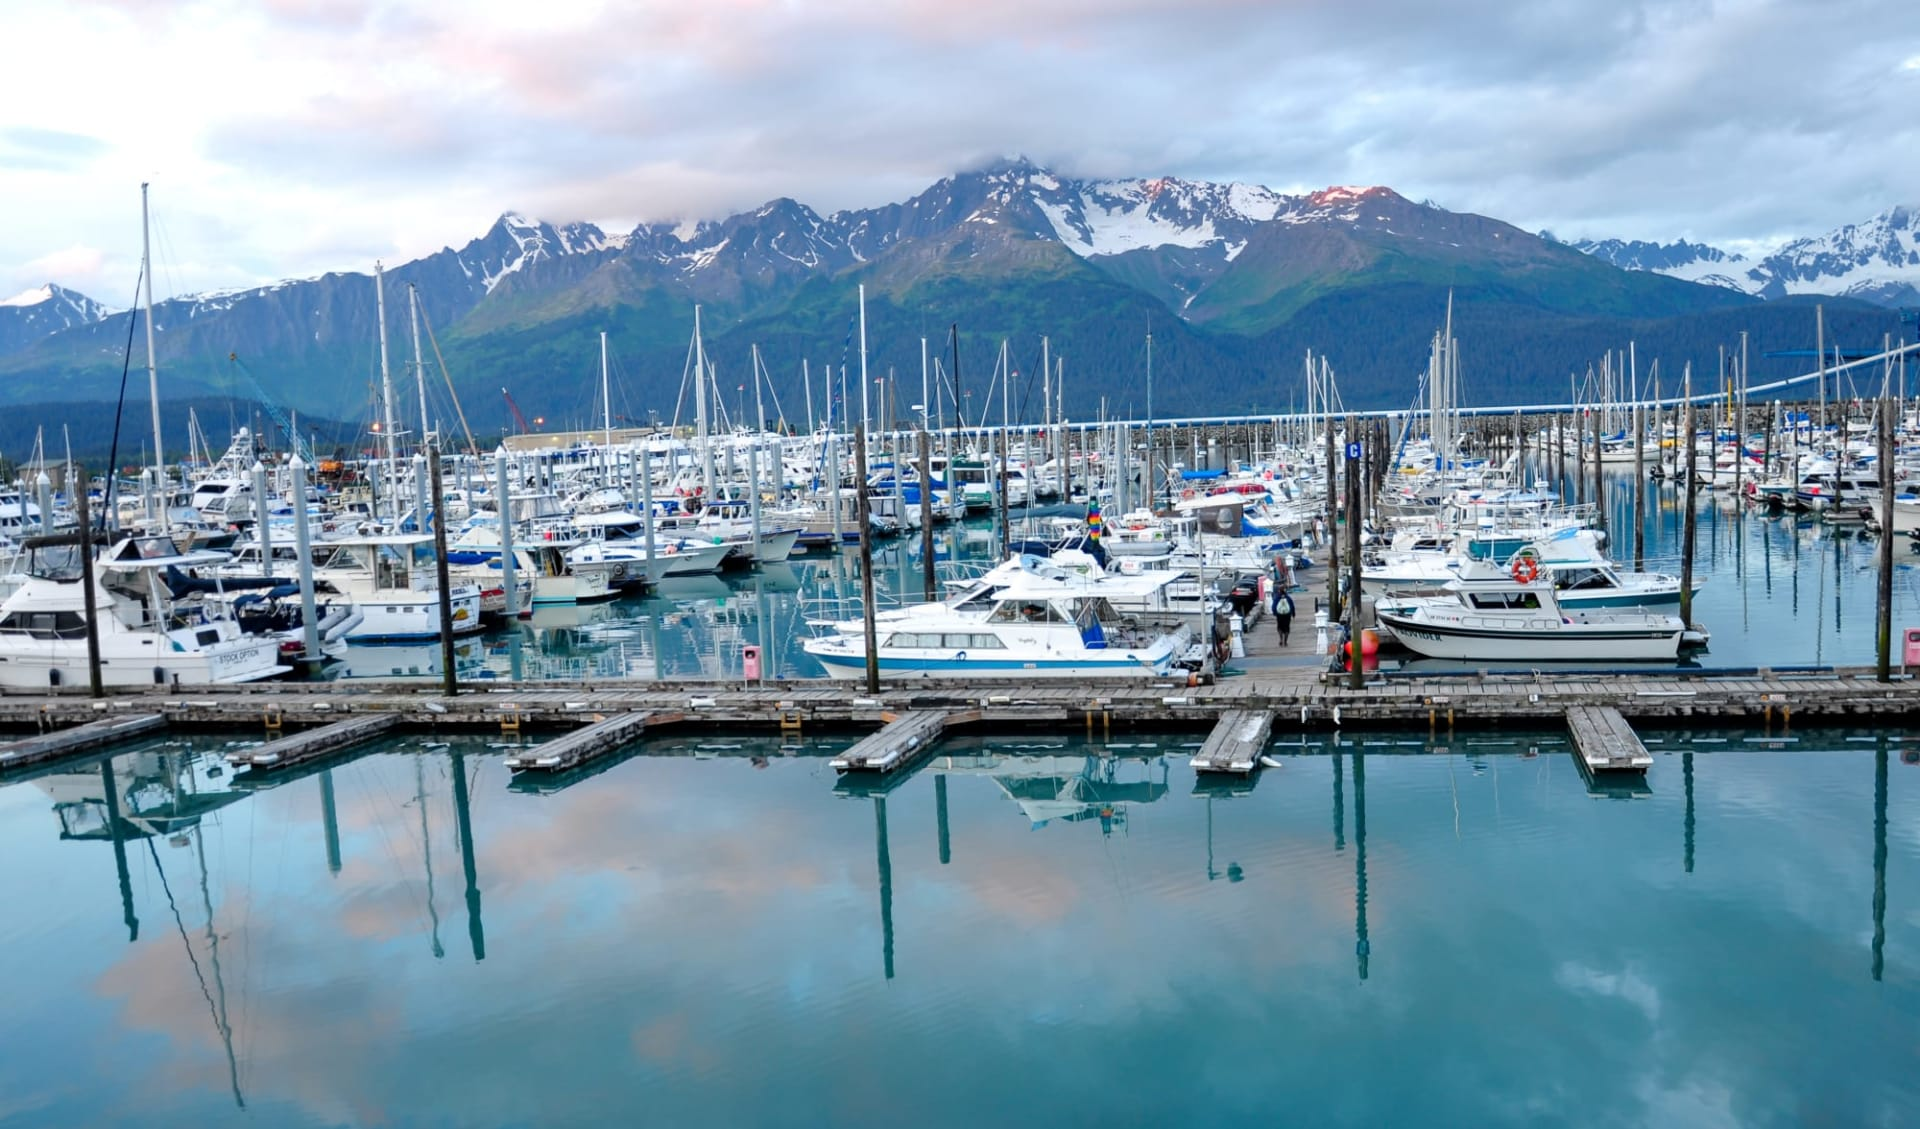 Abenteuer Yukon & Alaska ab Whitehorse: Alaska - Seward - Pier